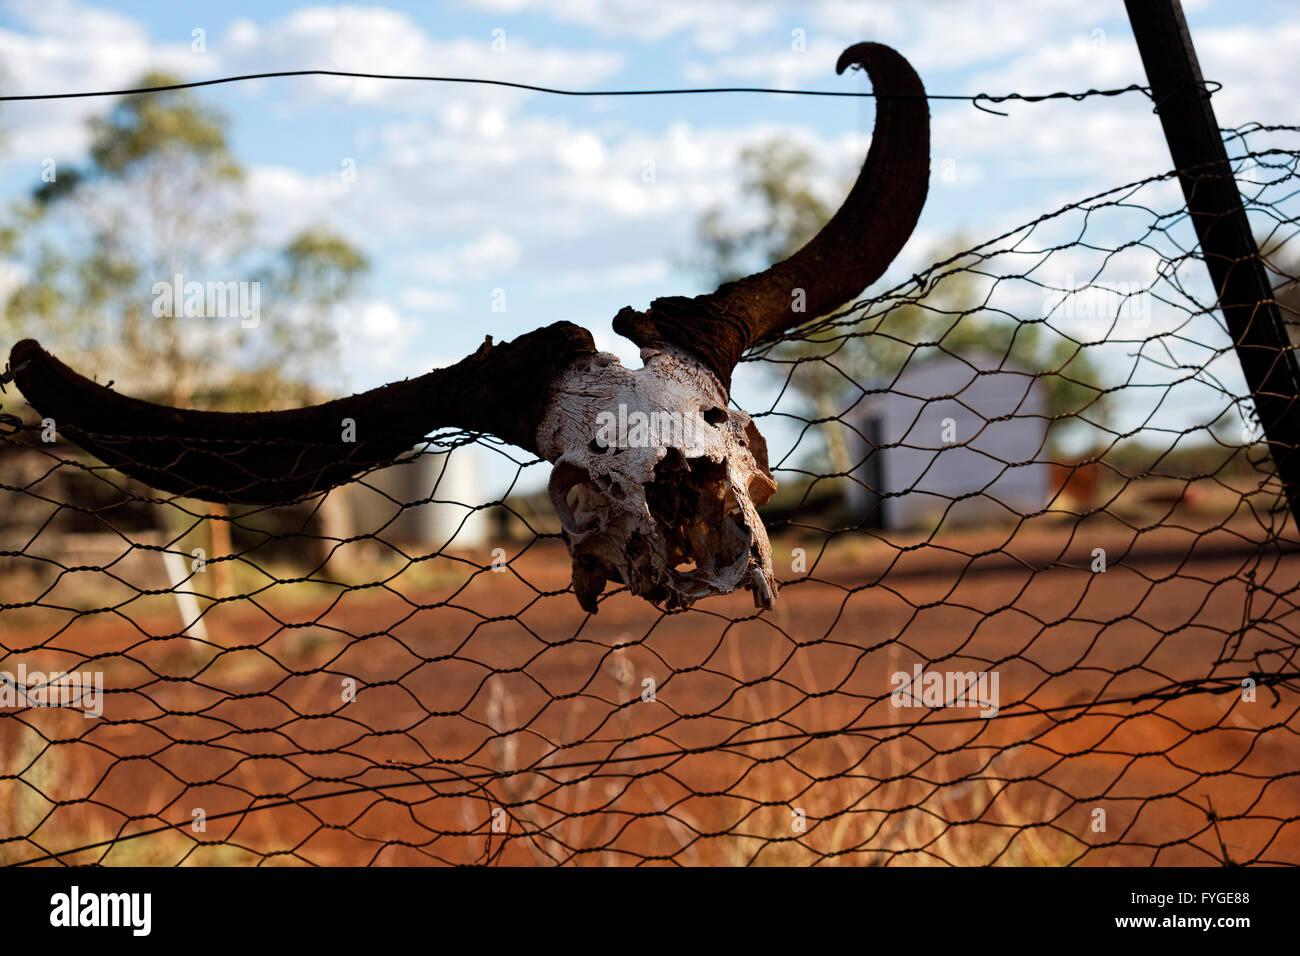 Animal skull on wire fence, Lake Mason, abandoned outback homestead, Central Midlands Western Australia - Stock Image